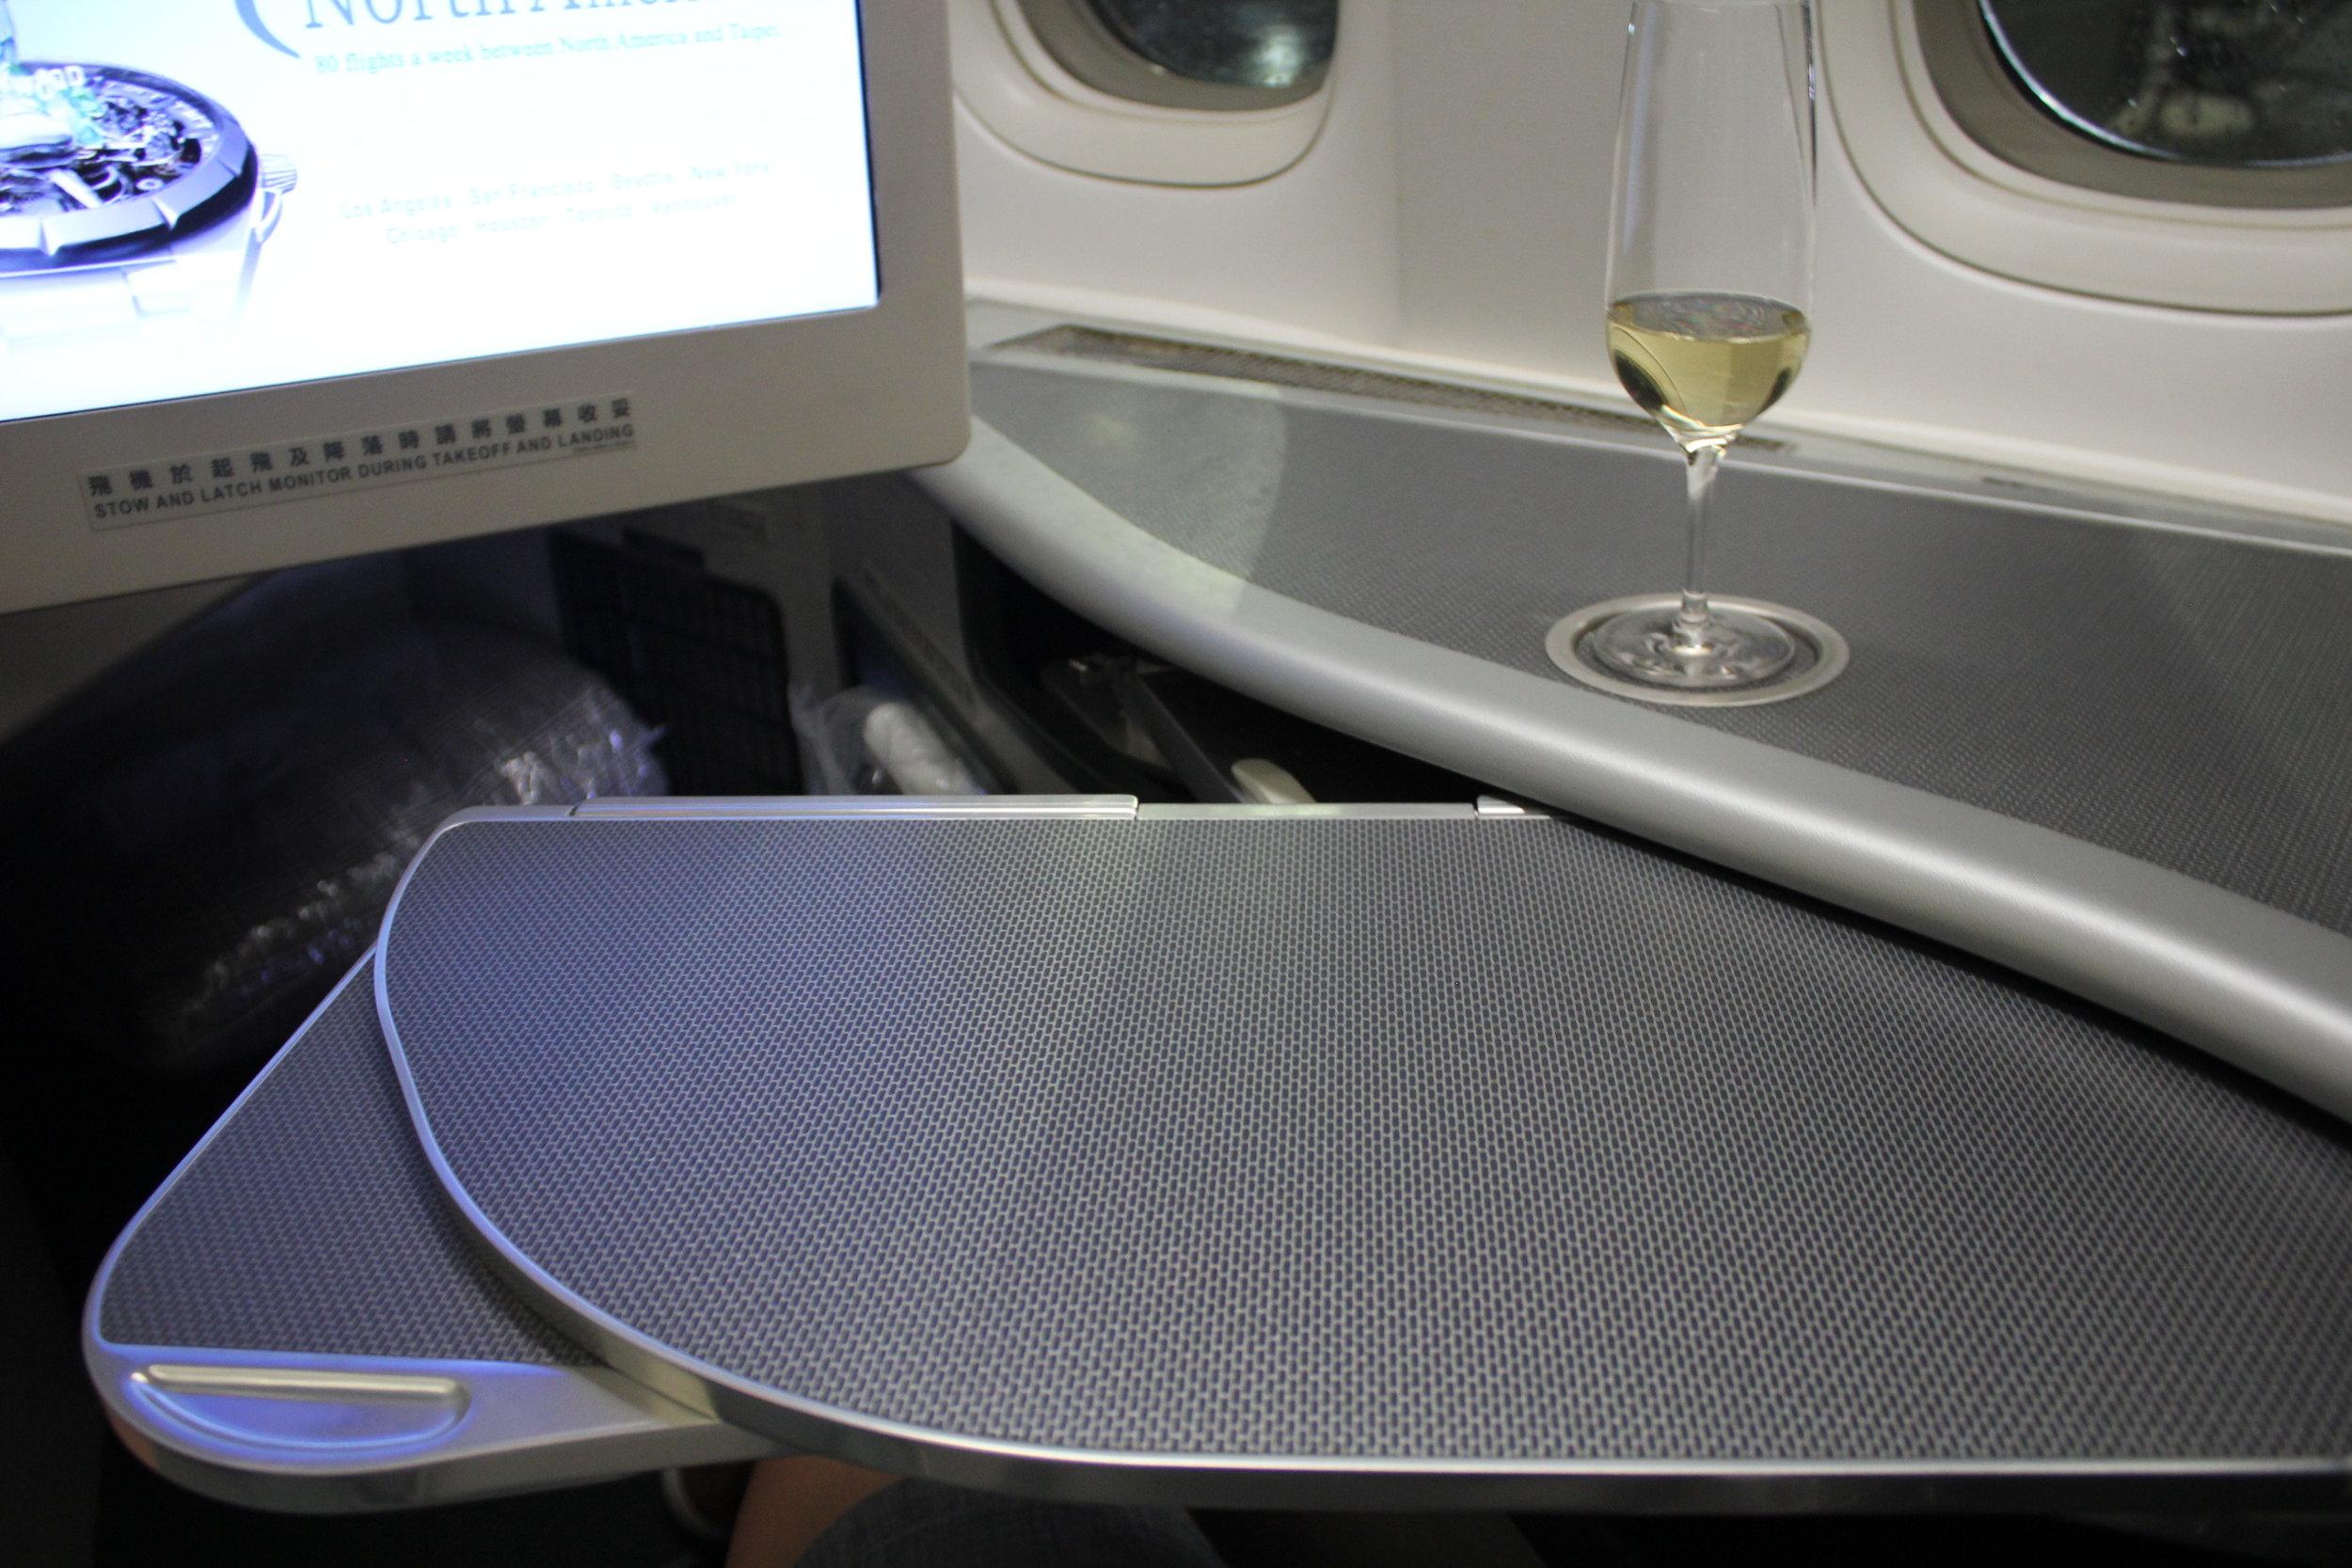 EVA Air business class – Tray table